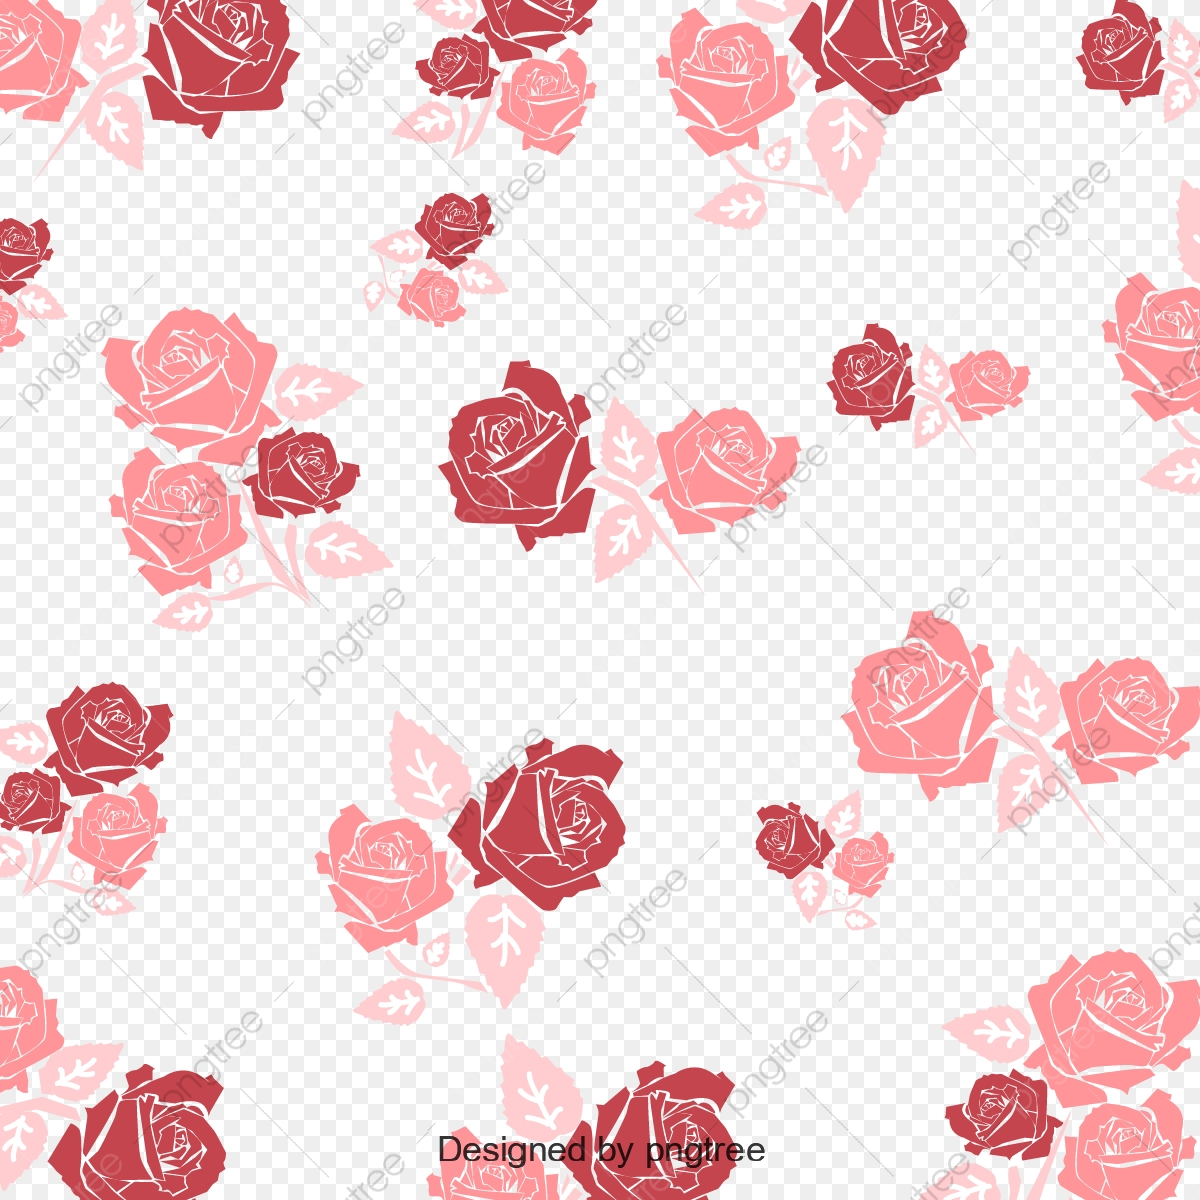 Rosa Patron Wallpaper Background Decoracion Vector Rose